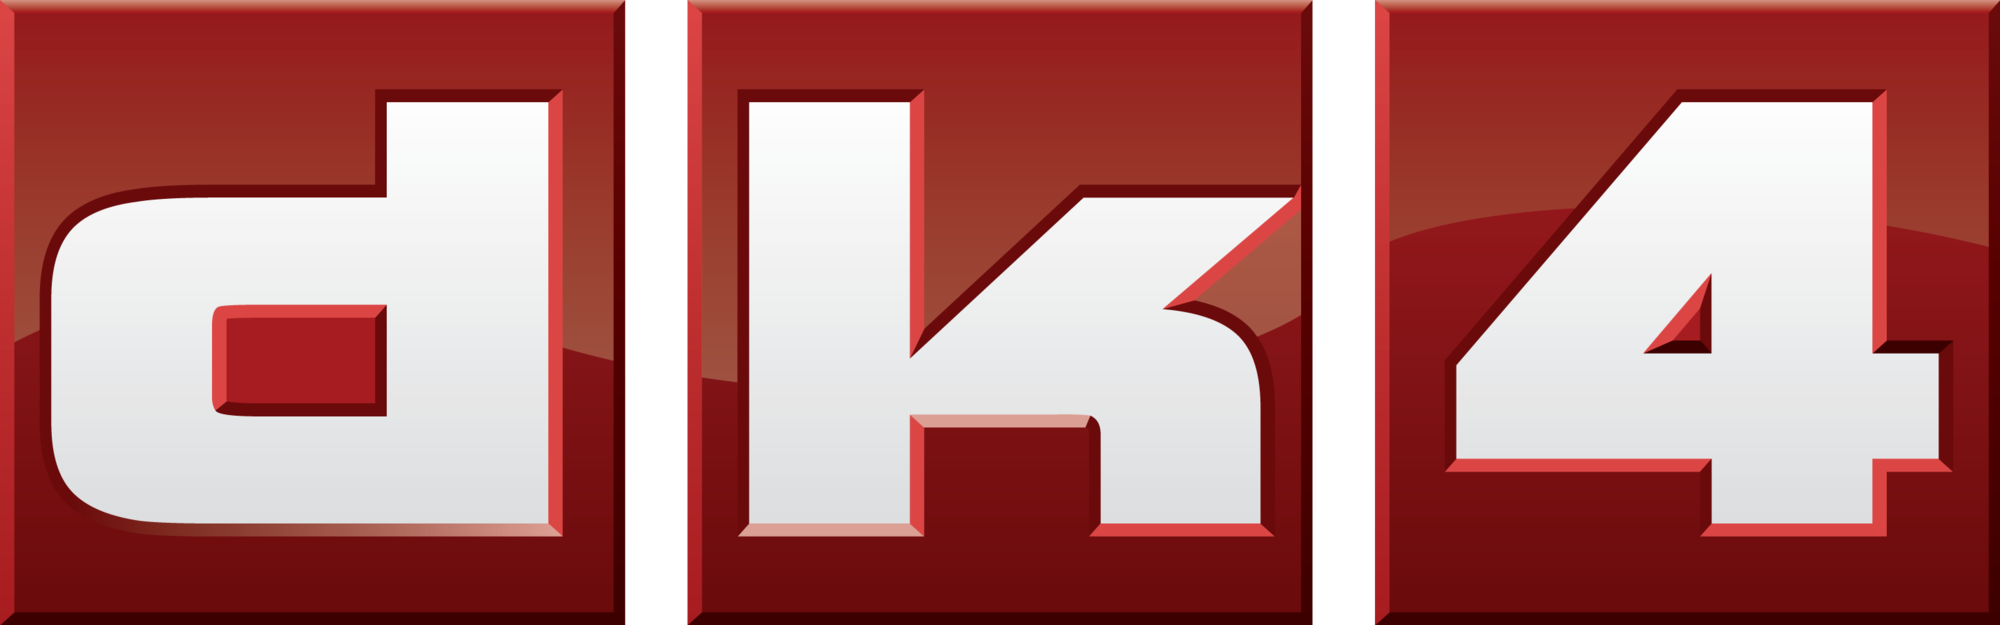 Dk4_logo_2010.png